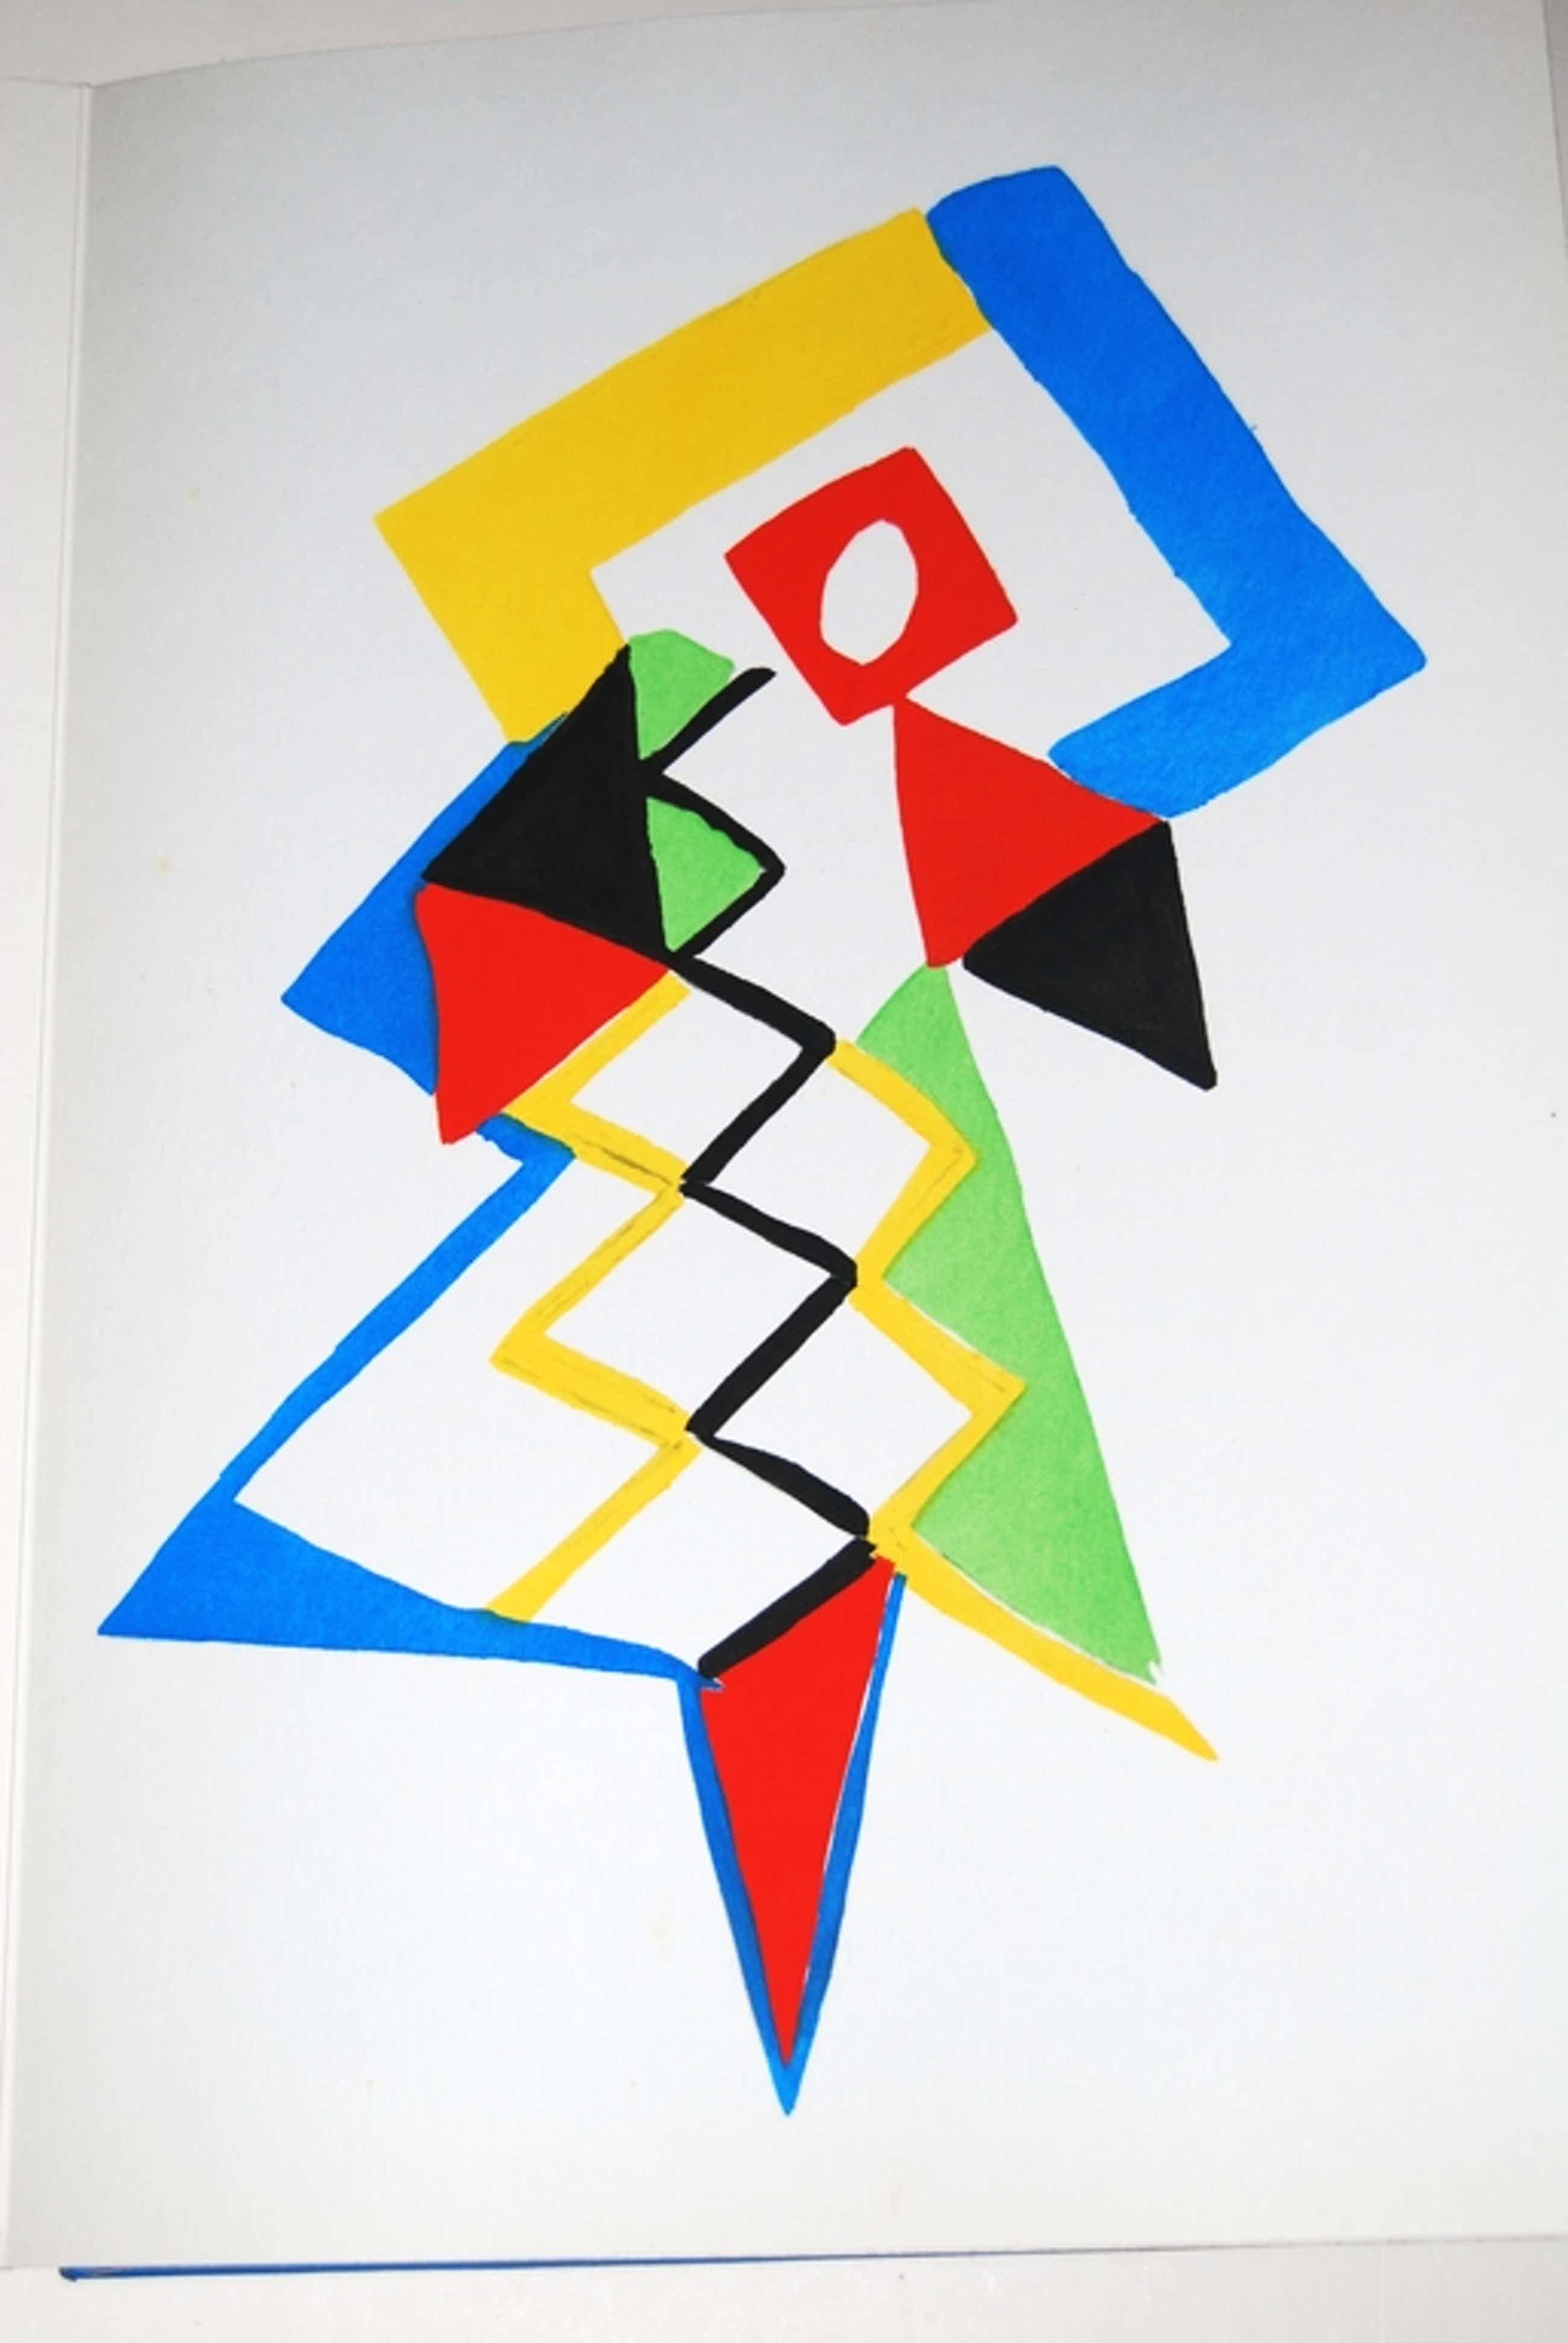 Sonia Delaunay, Tableaux Vivants, 1969, 27 pochoirs van modeontwerpen, nr. 66/500 kopen? Bied vanaf 950!